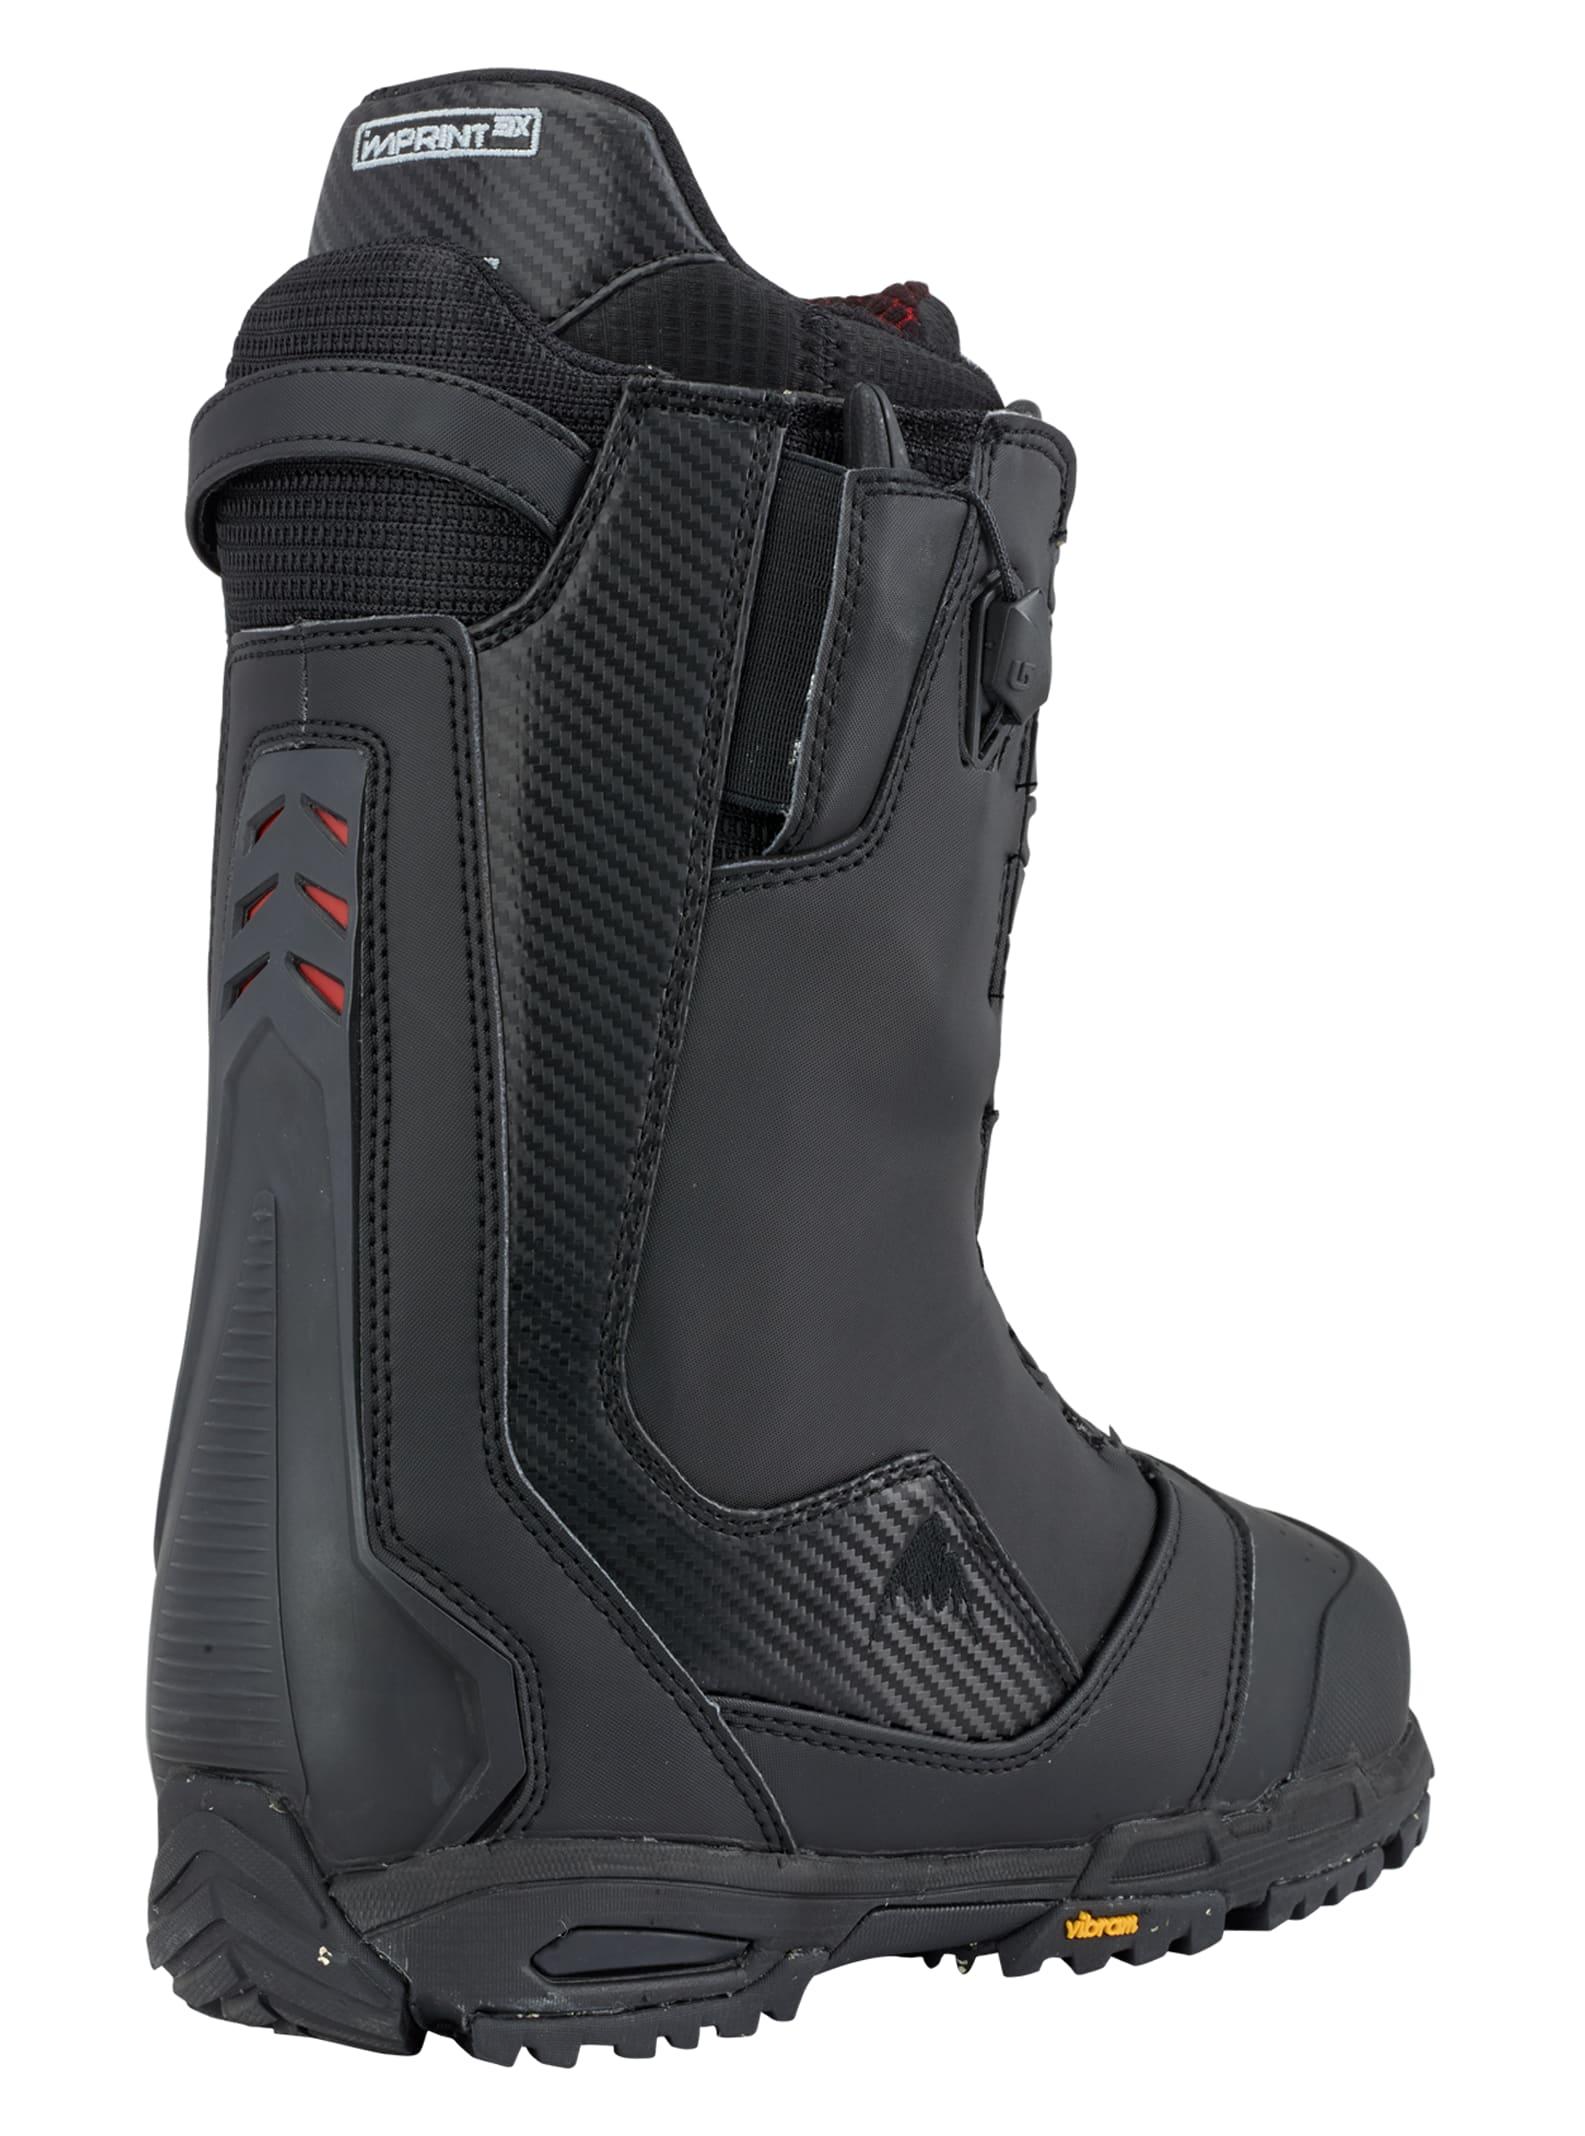 Men's Burton Driver X Snowboard Boot